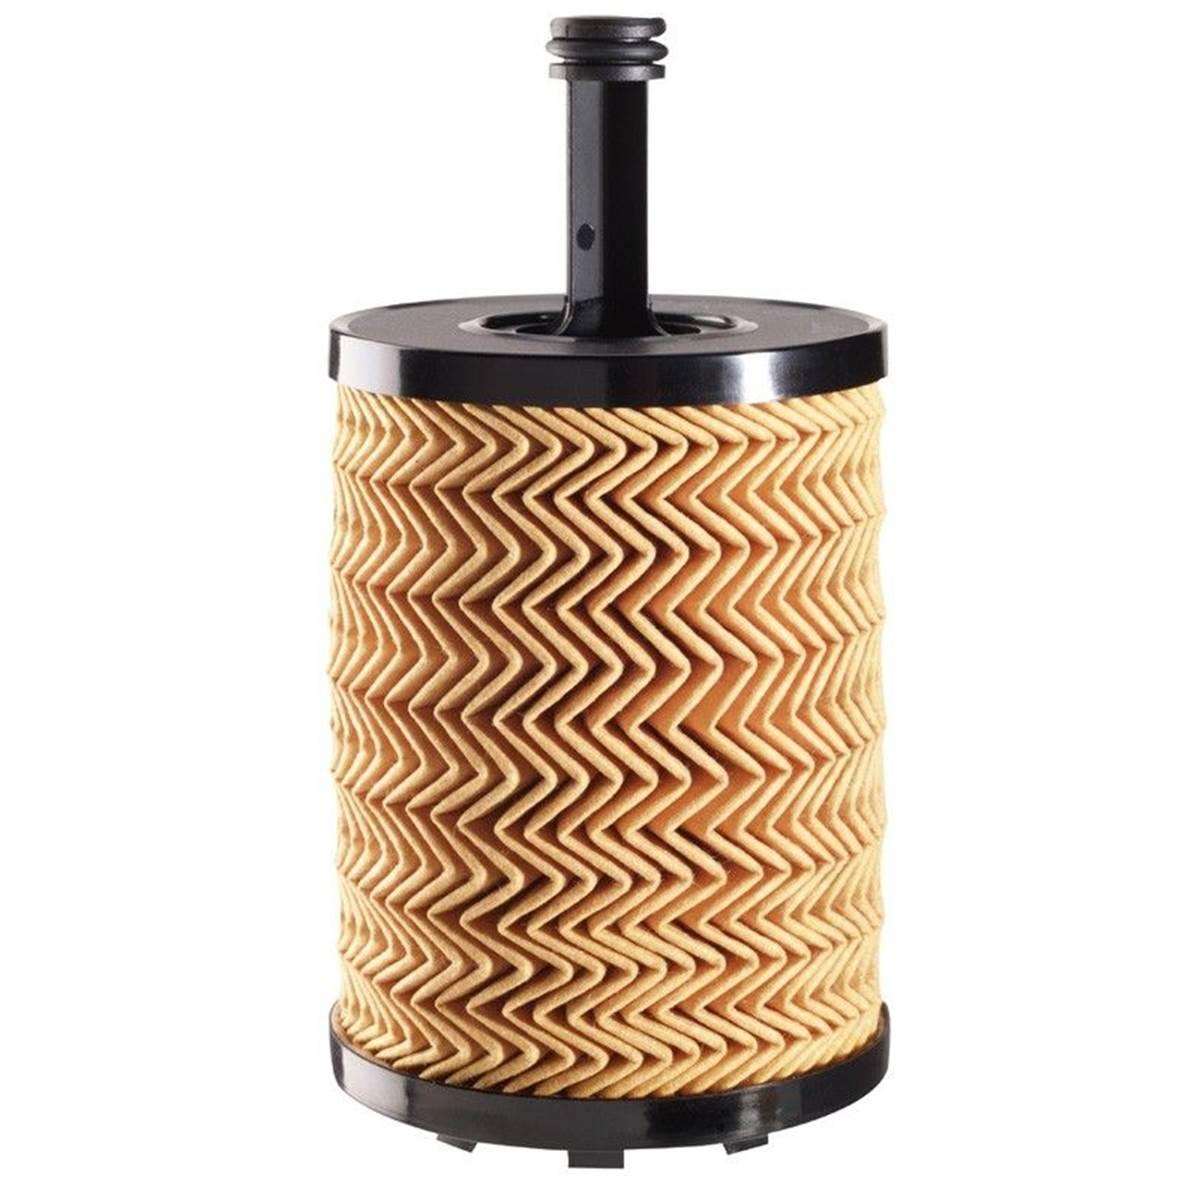 Purflux L311 filtre /à huile